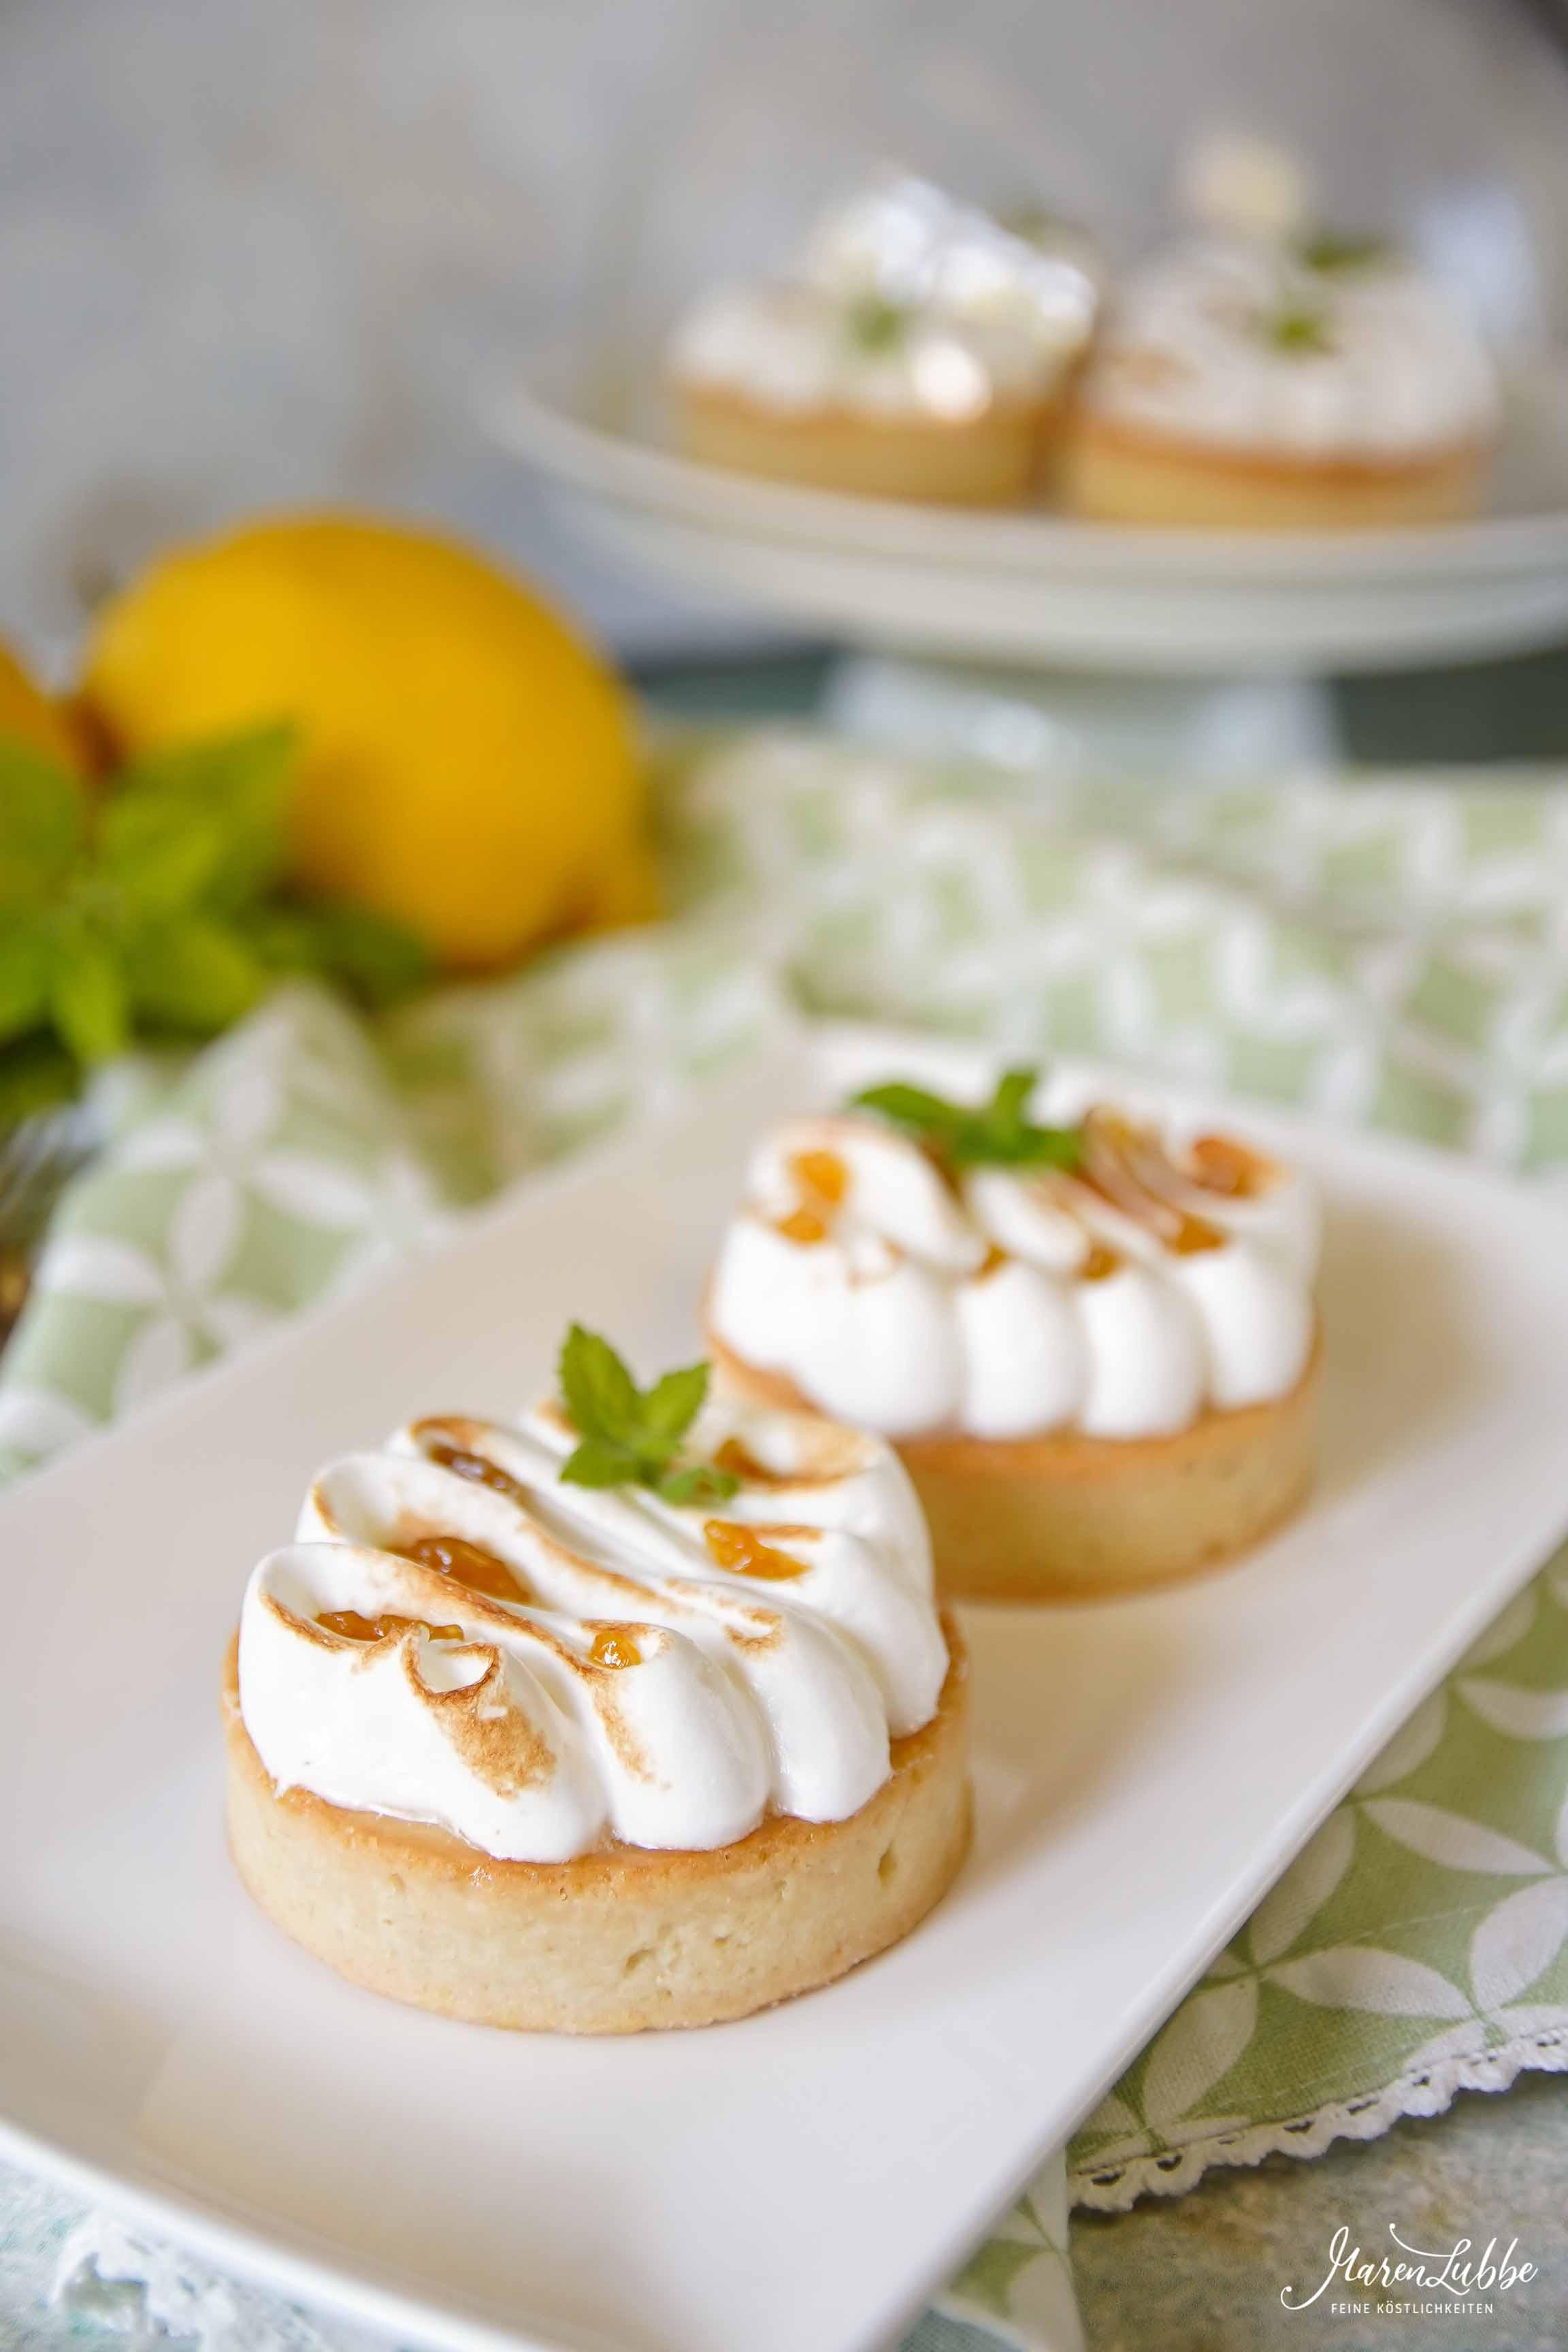 Tartelettes au citron - Zitronentartelettes